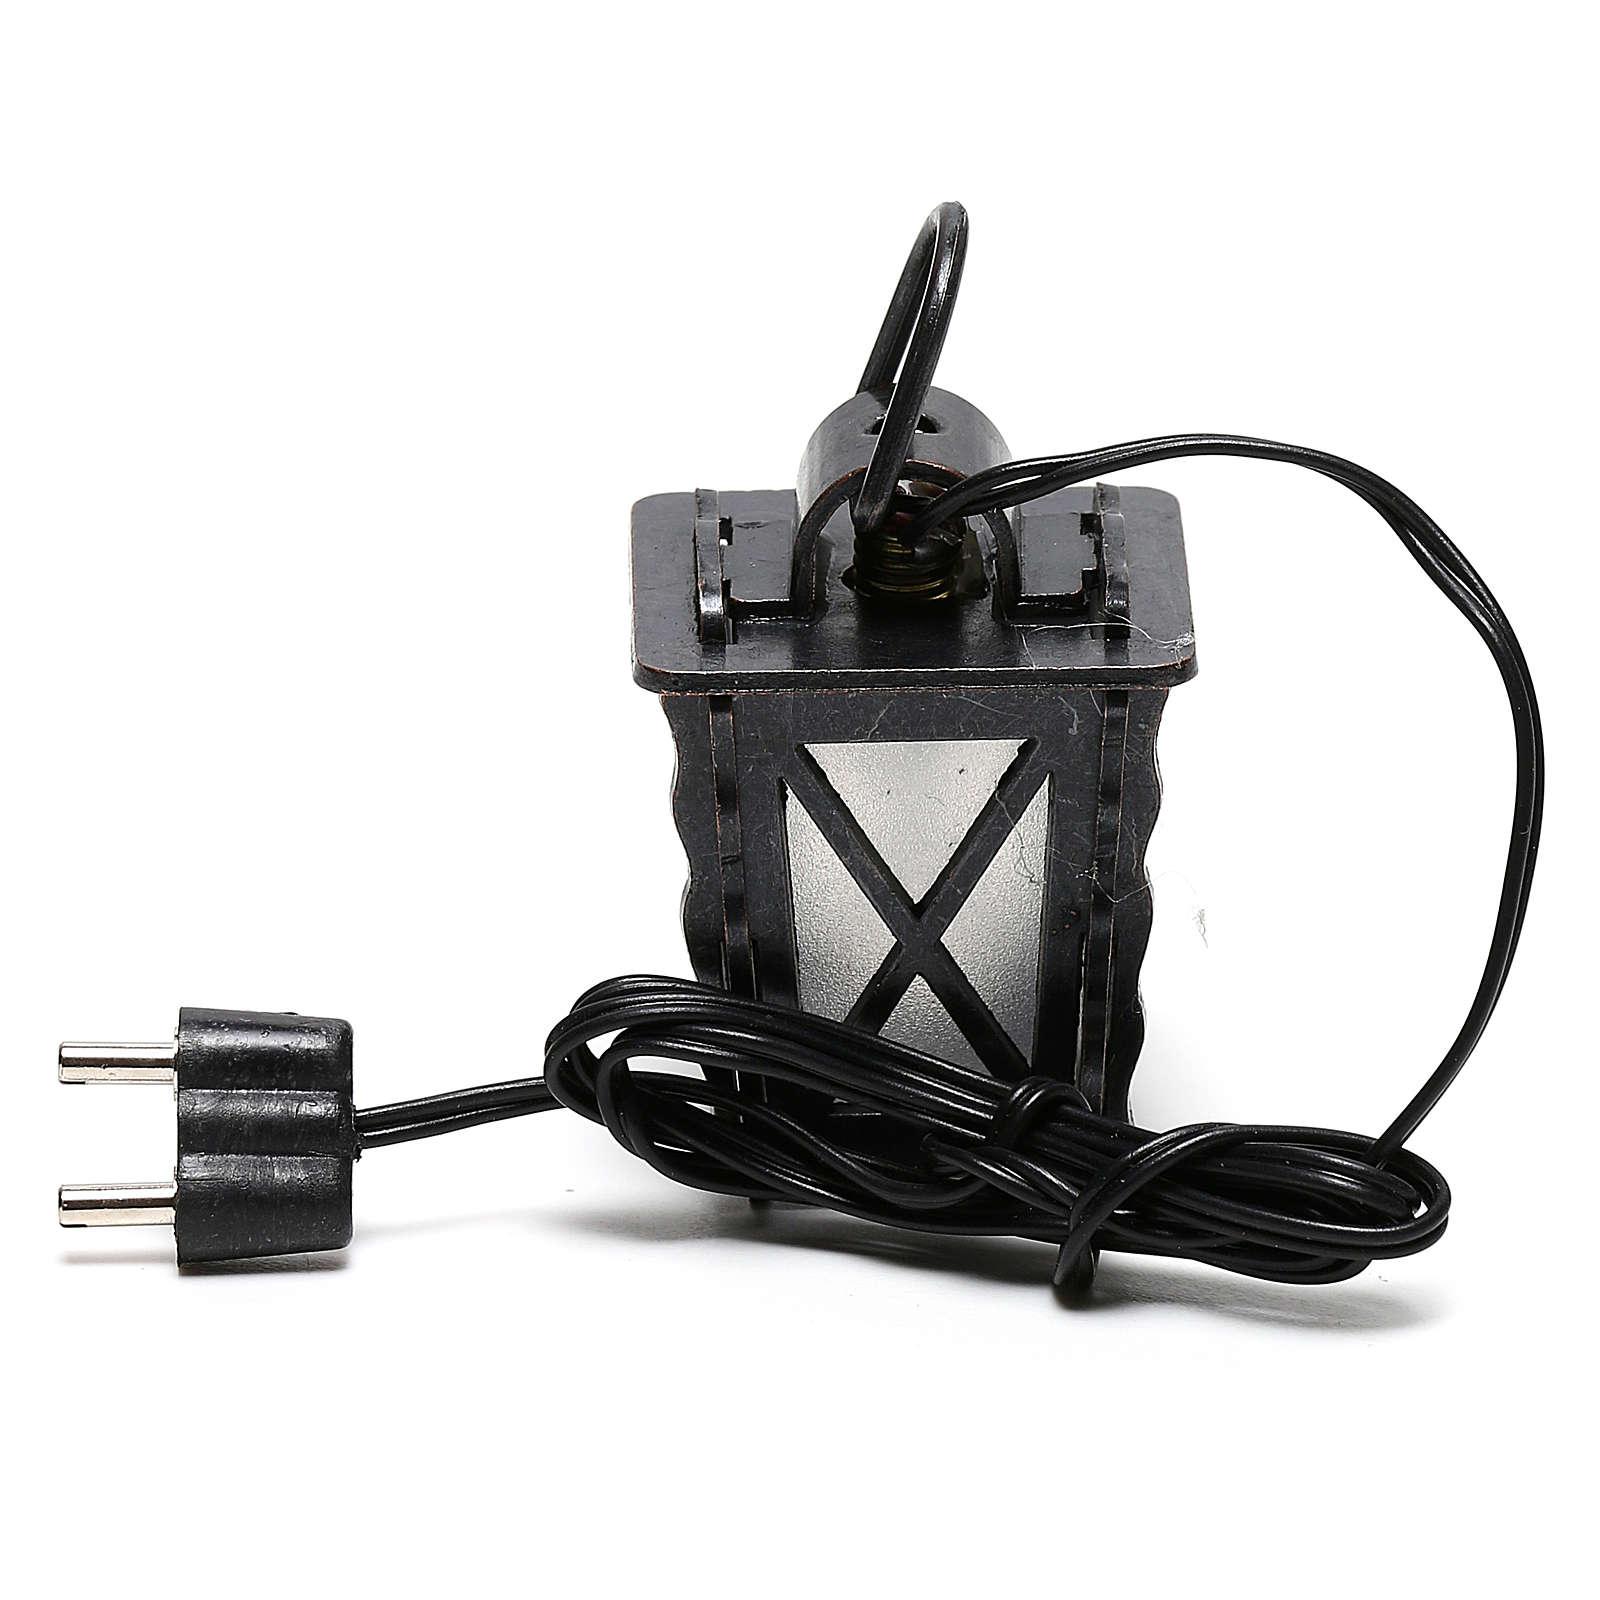 Lanterna in metallo con luce bianca h 4 cm presepe 8-10 cm bassa tensione 4